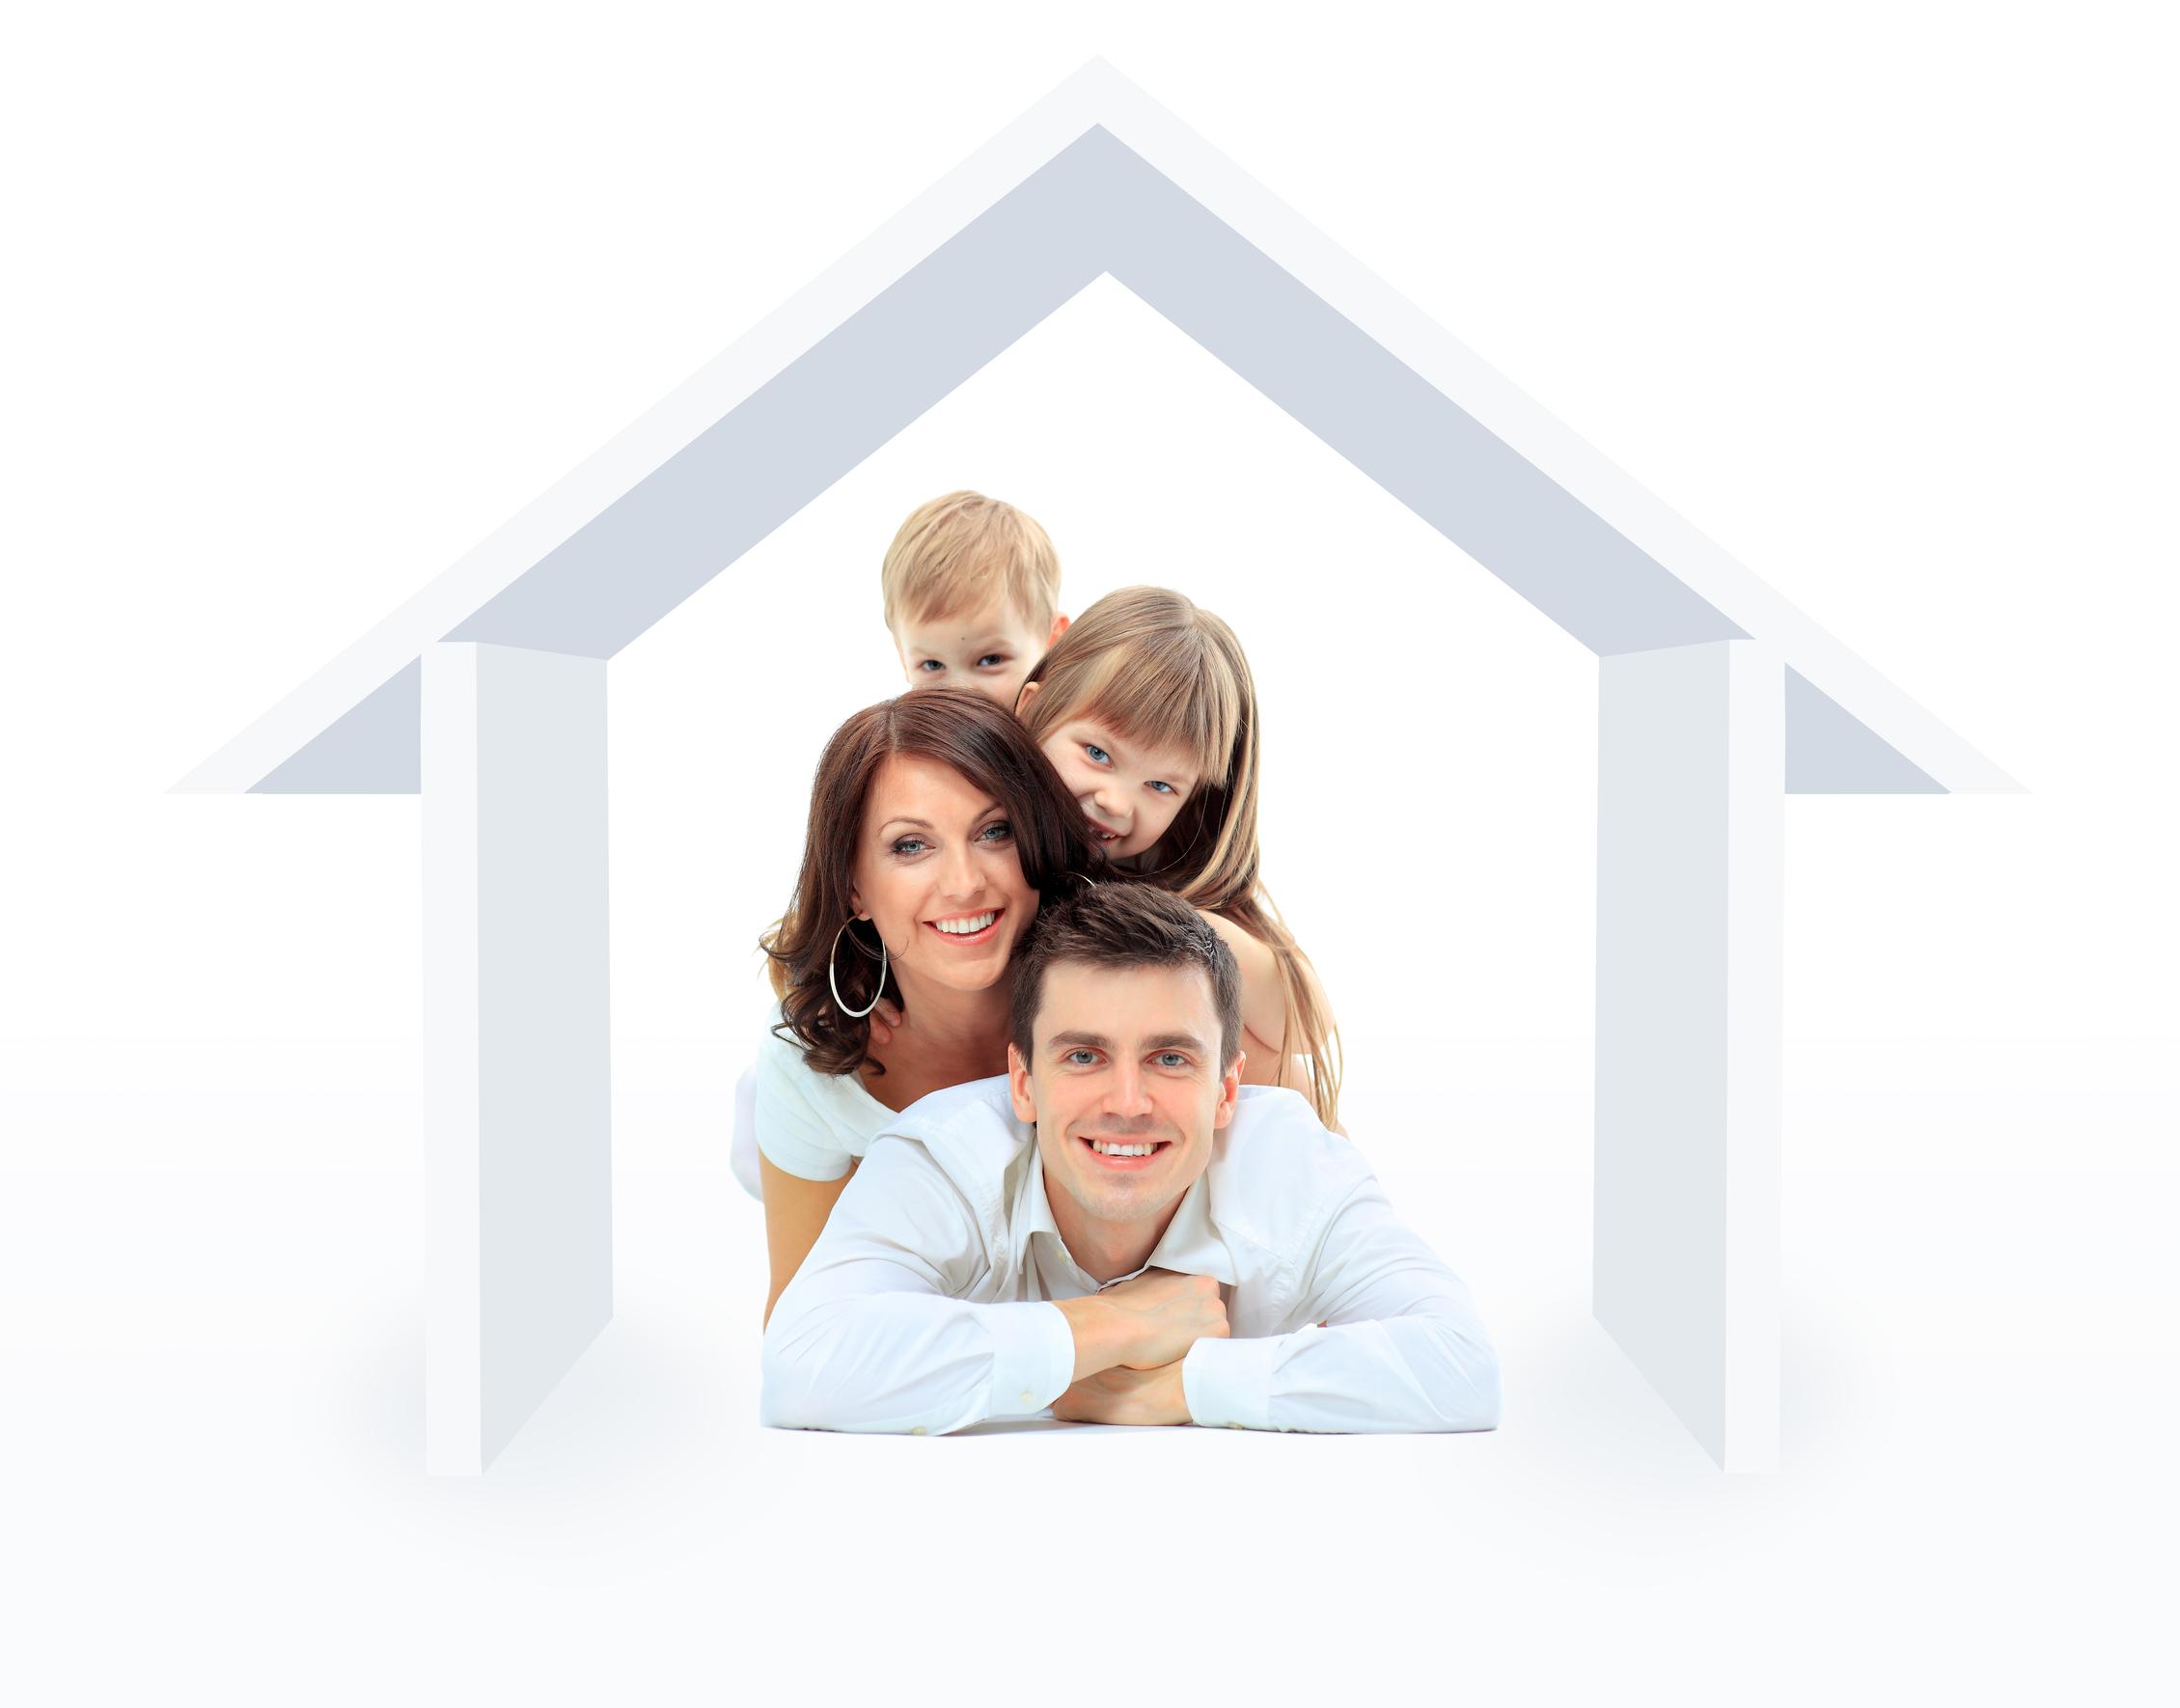 Ипотека Молодая семья условия 2016